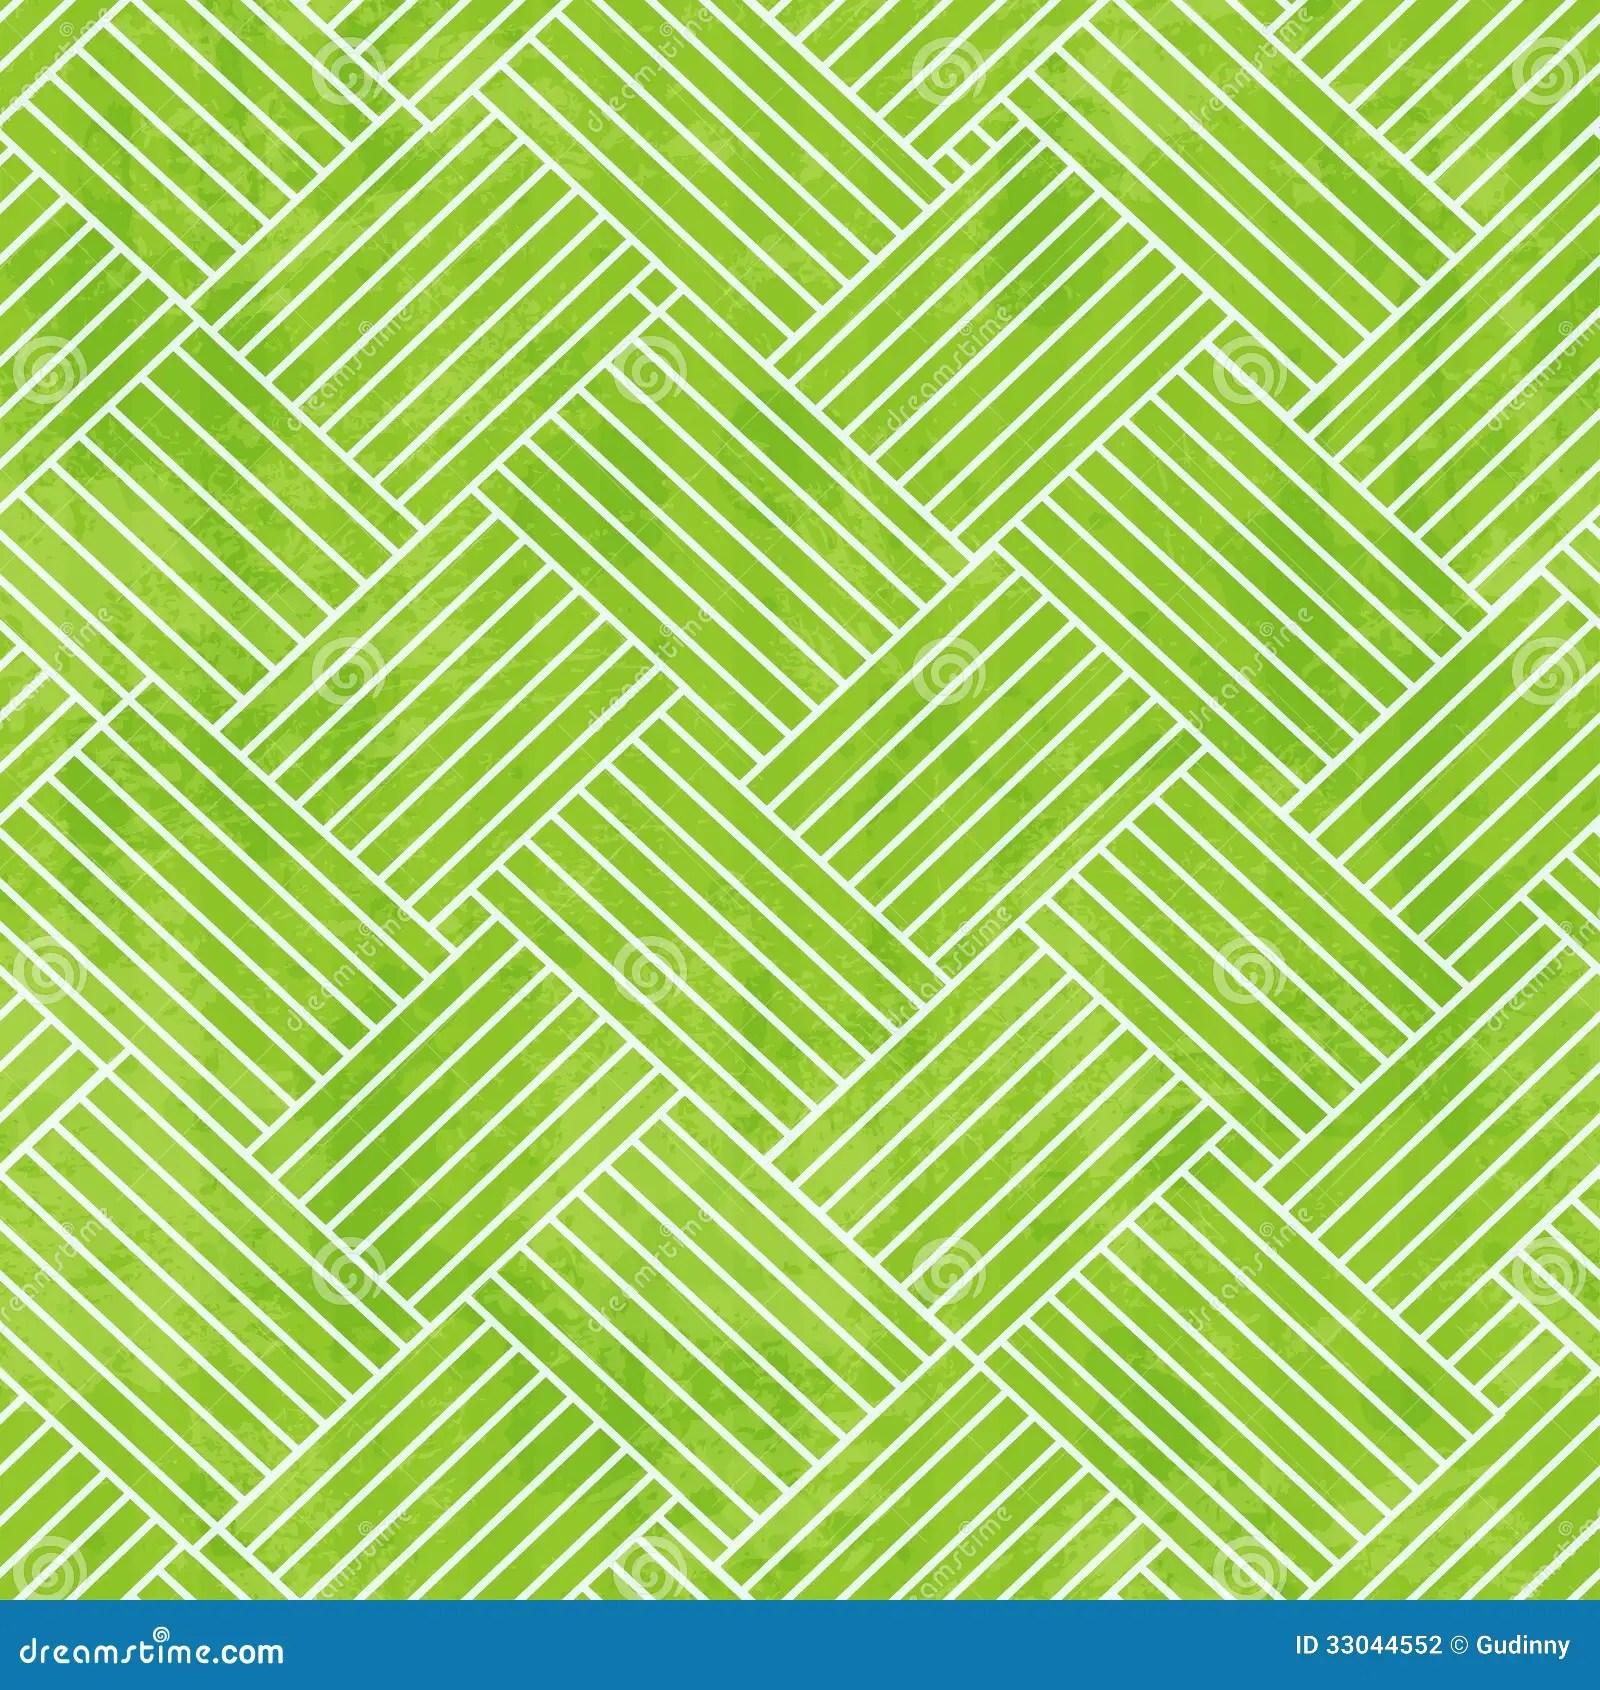 Grunge Girl Wallpaper Green Fabric Seamless Texture With Grunge Effect Stock